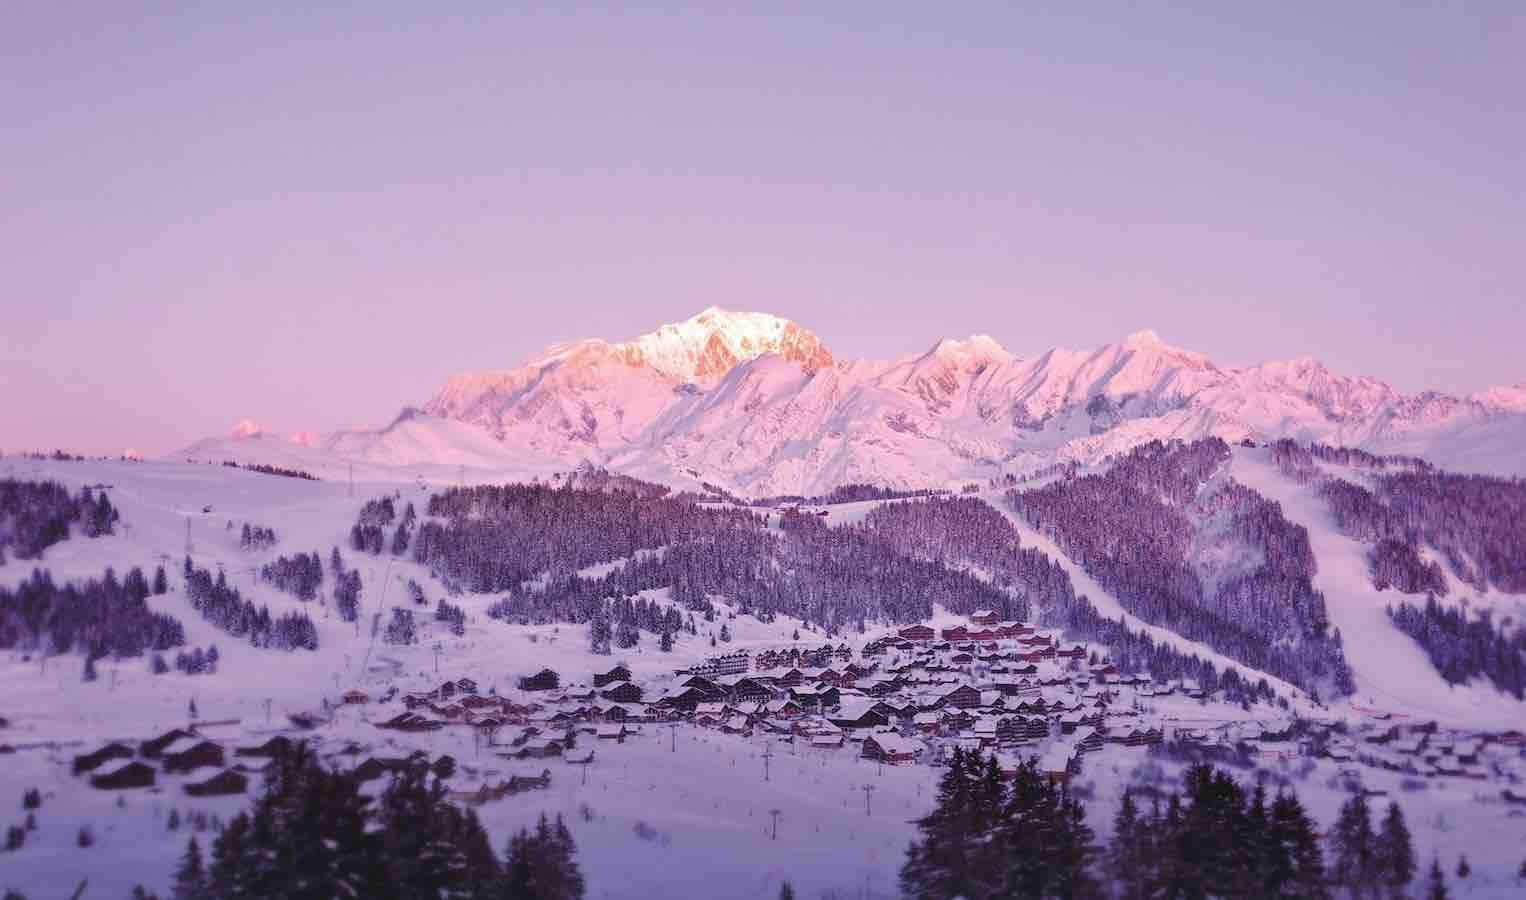 Sunset at Les Saisies Ski Resort